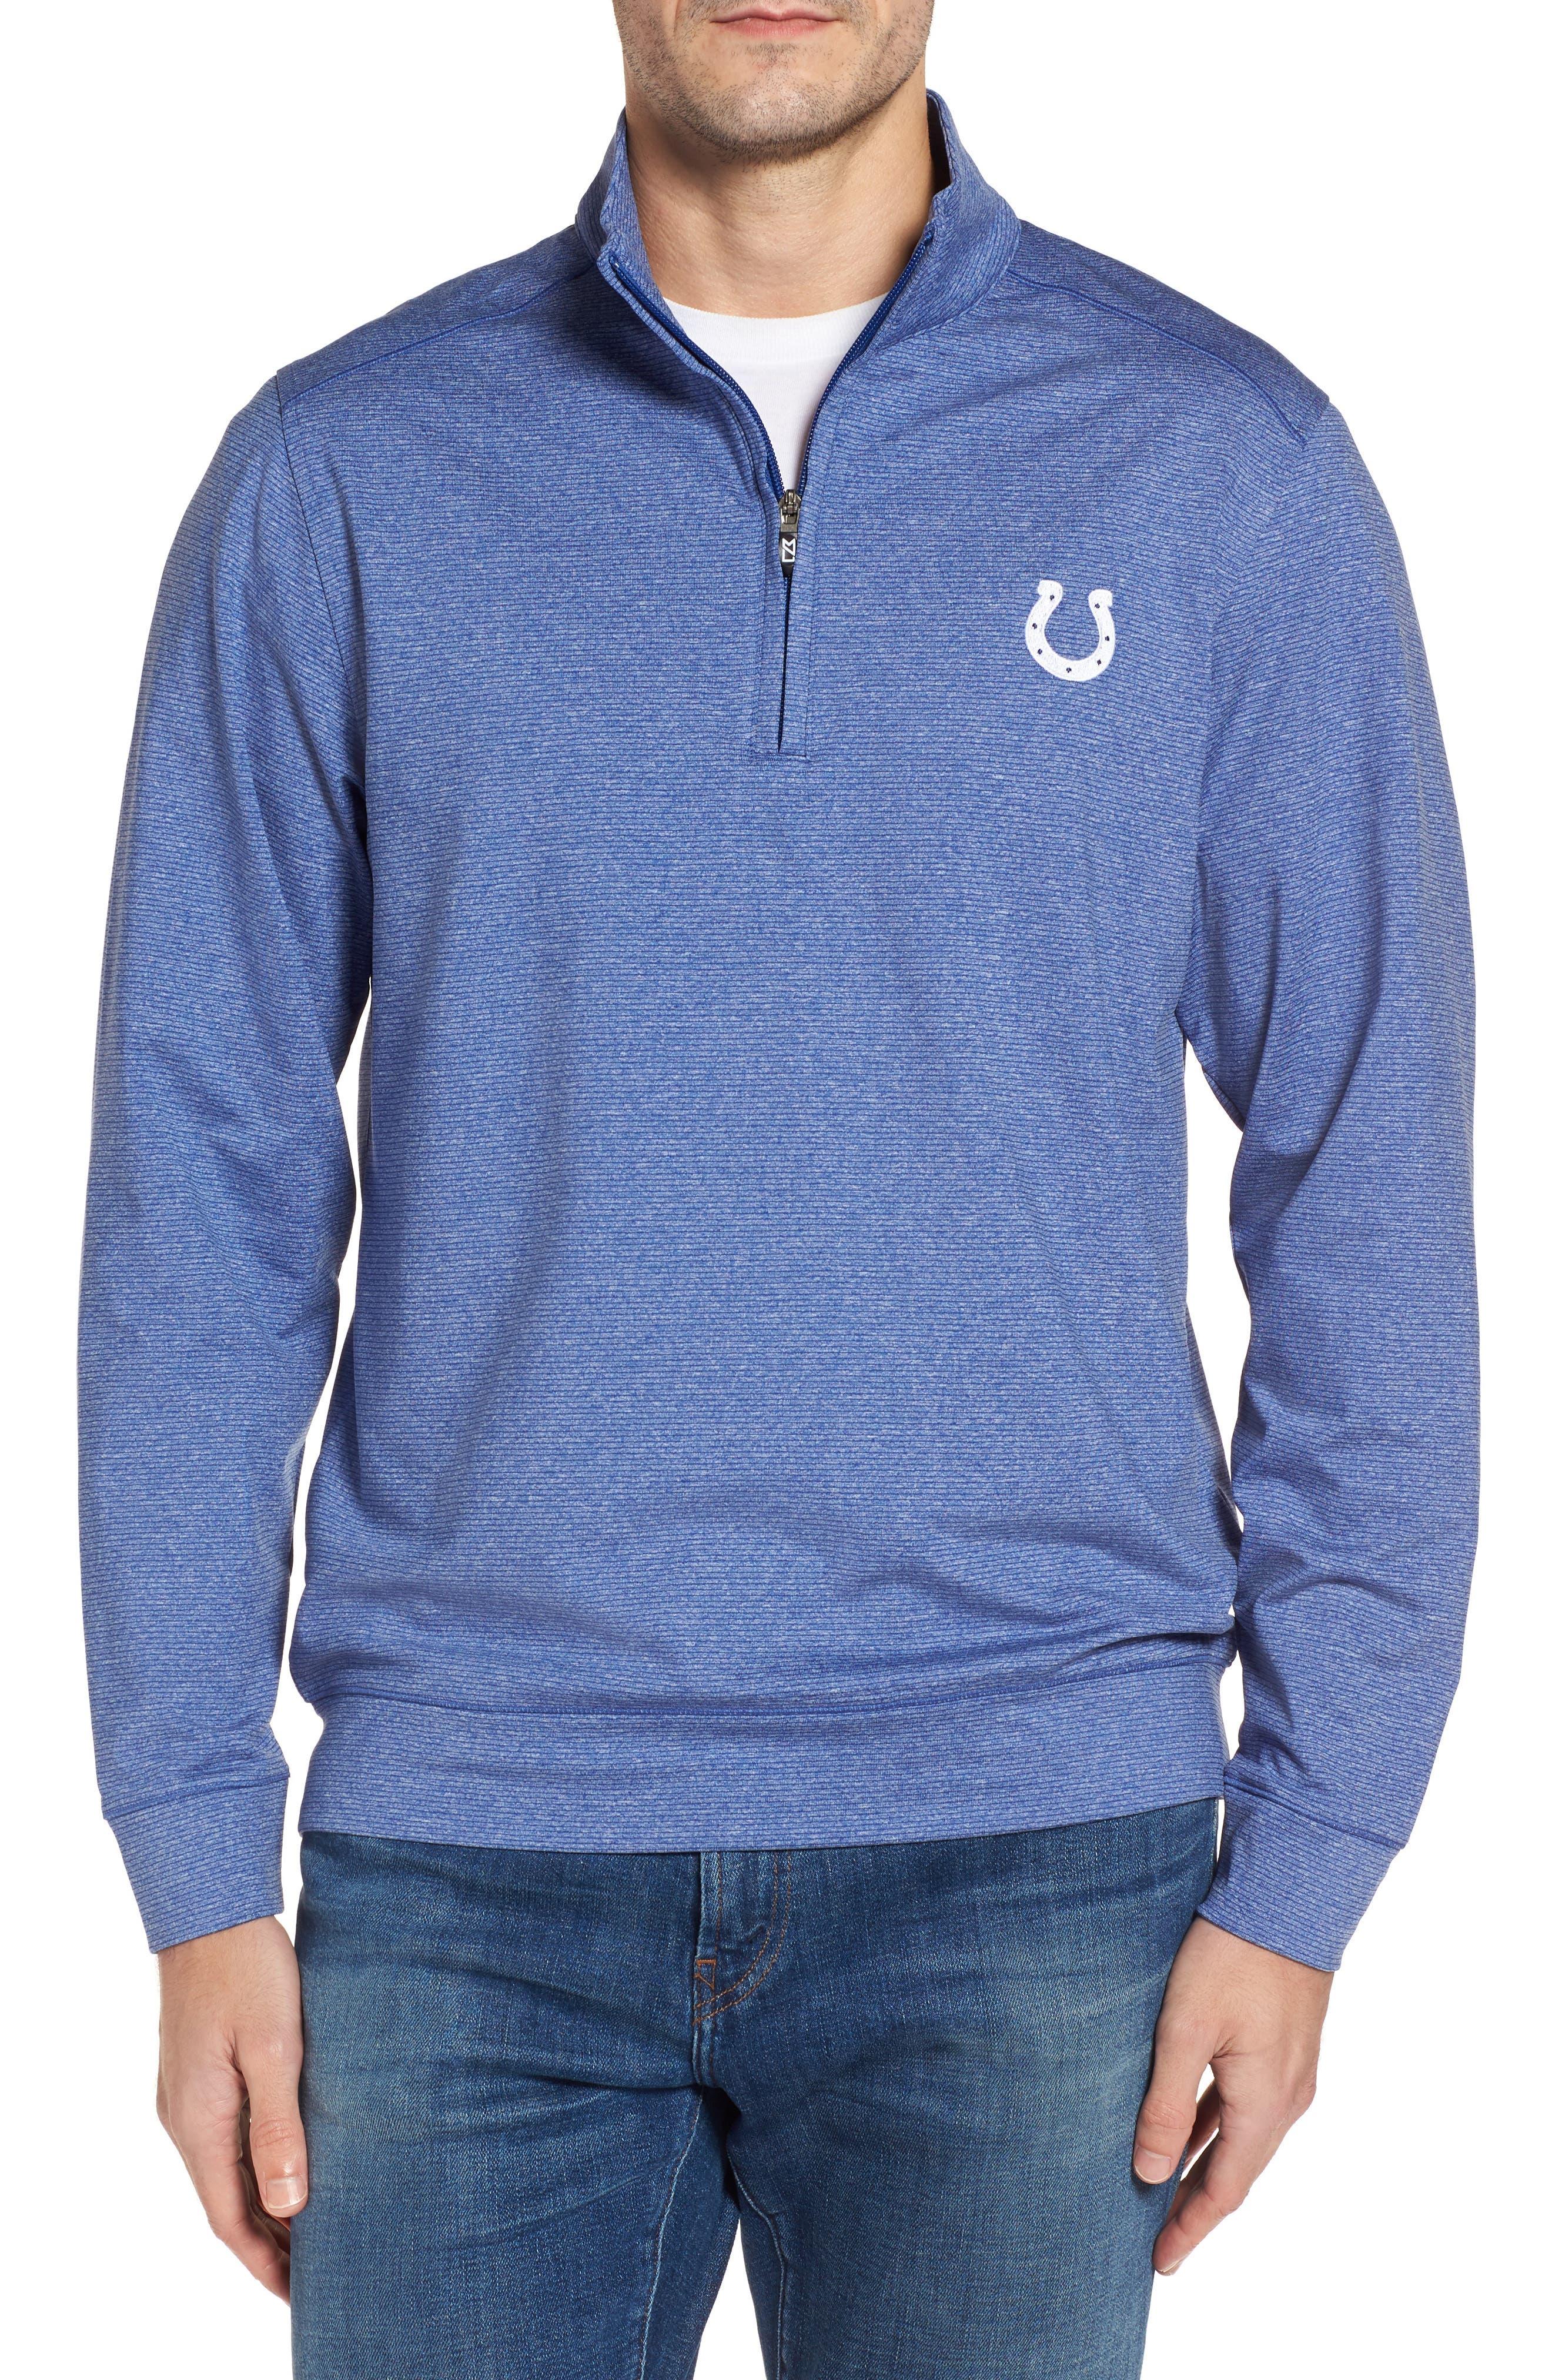 Main Image - Cutter & Buck Shoreline - Indianapolis Colts Half Zip Pullover